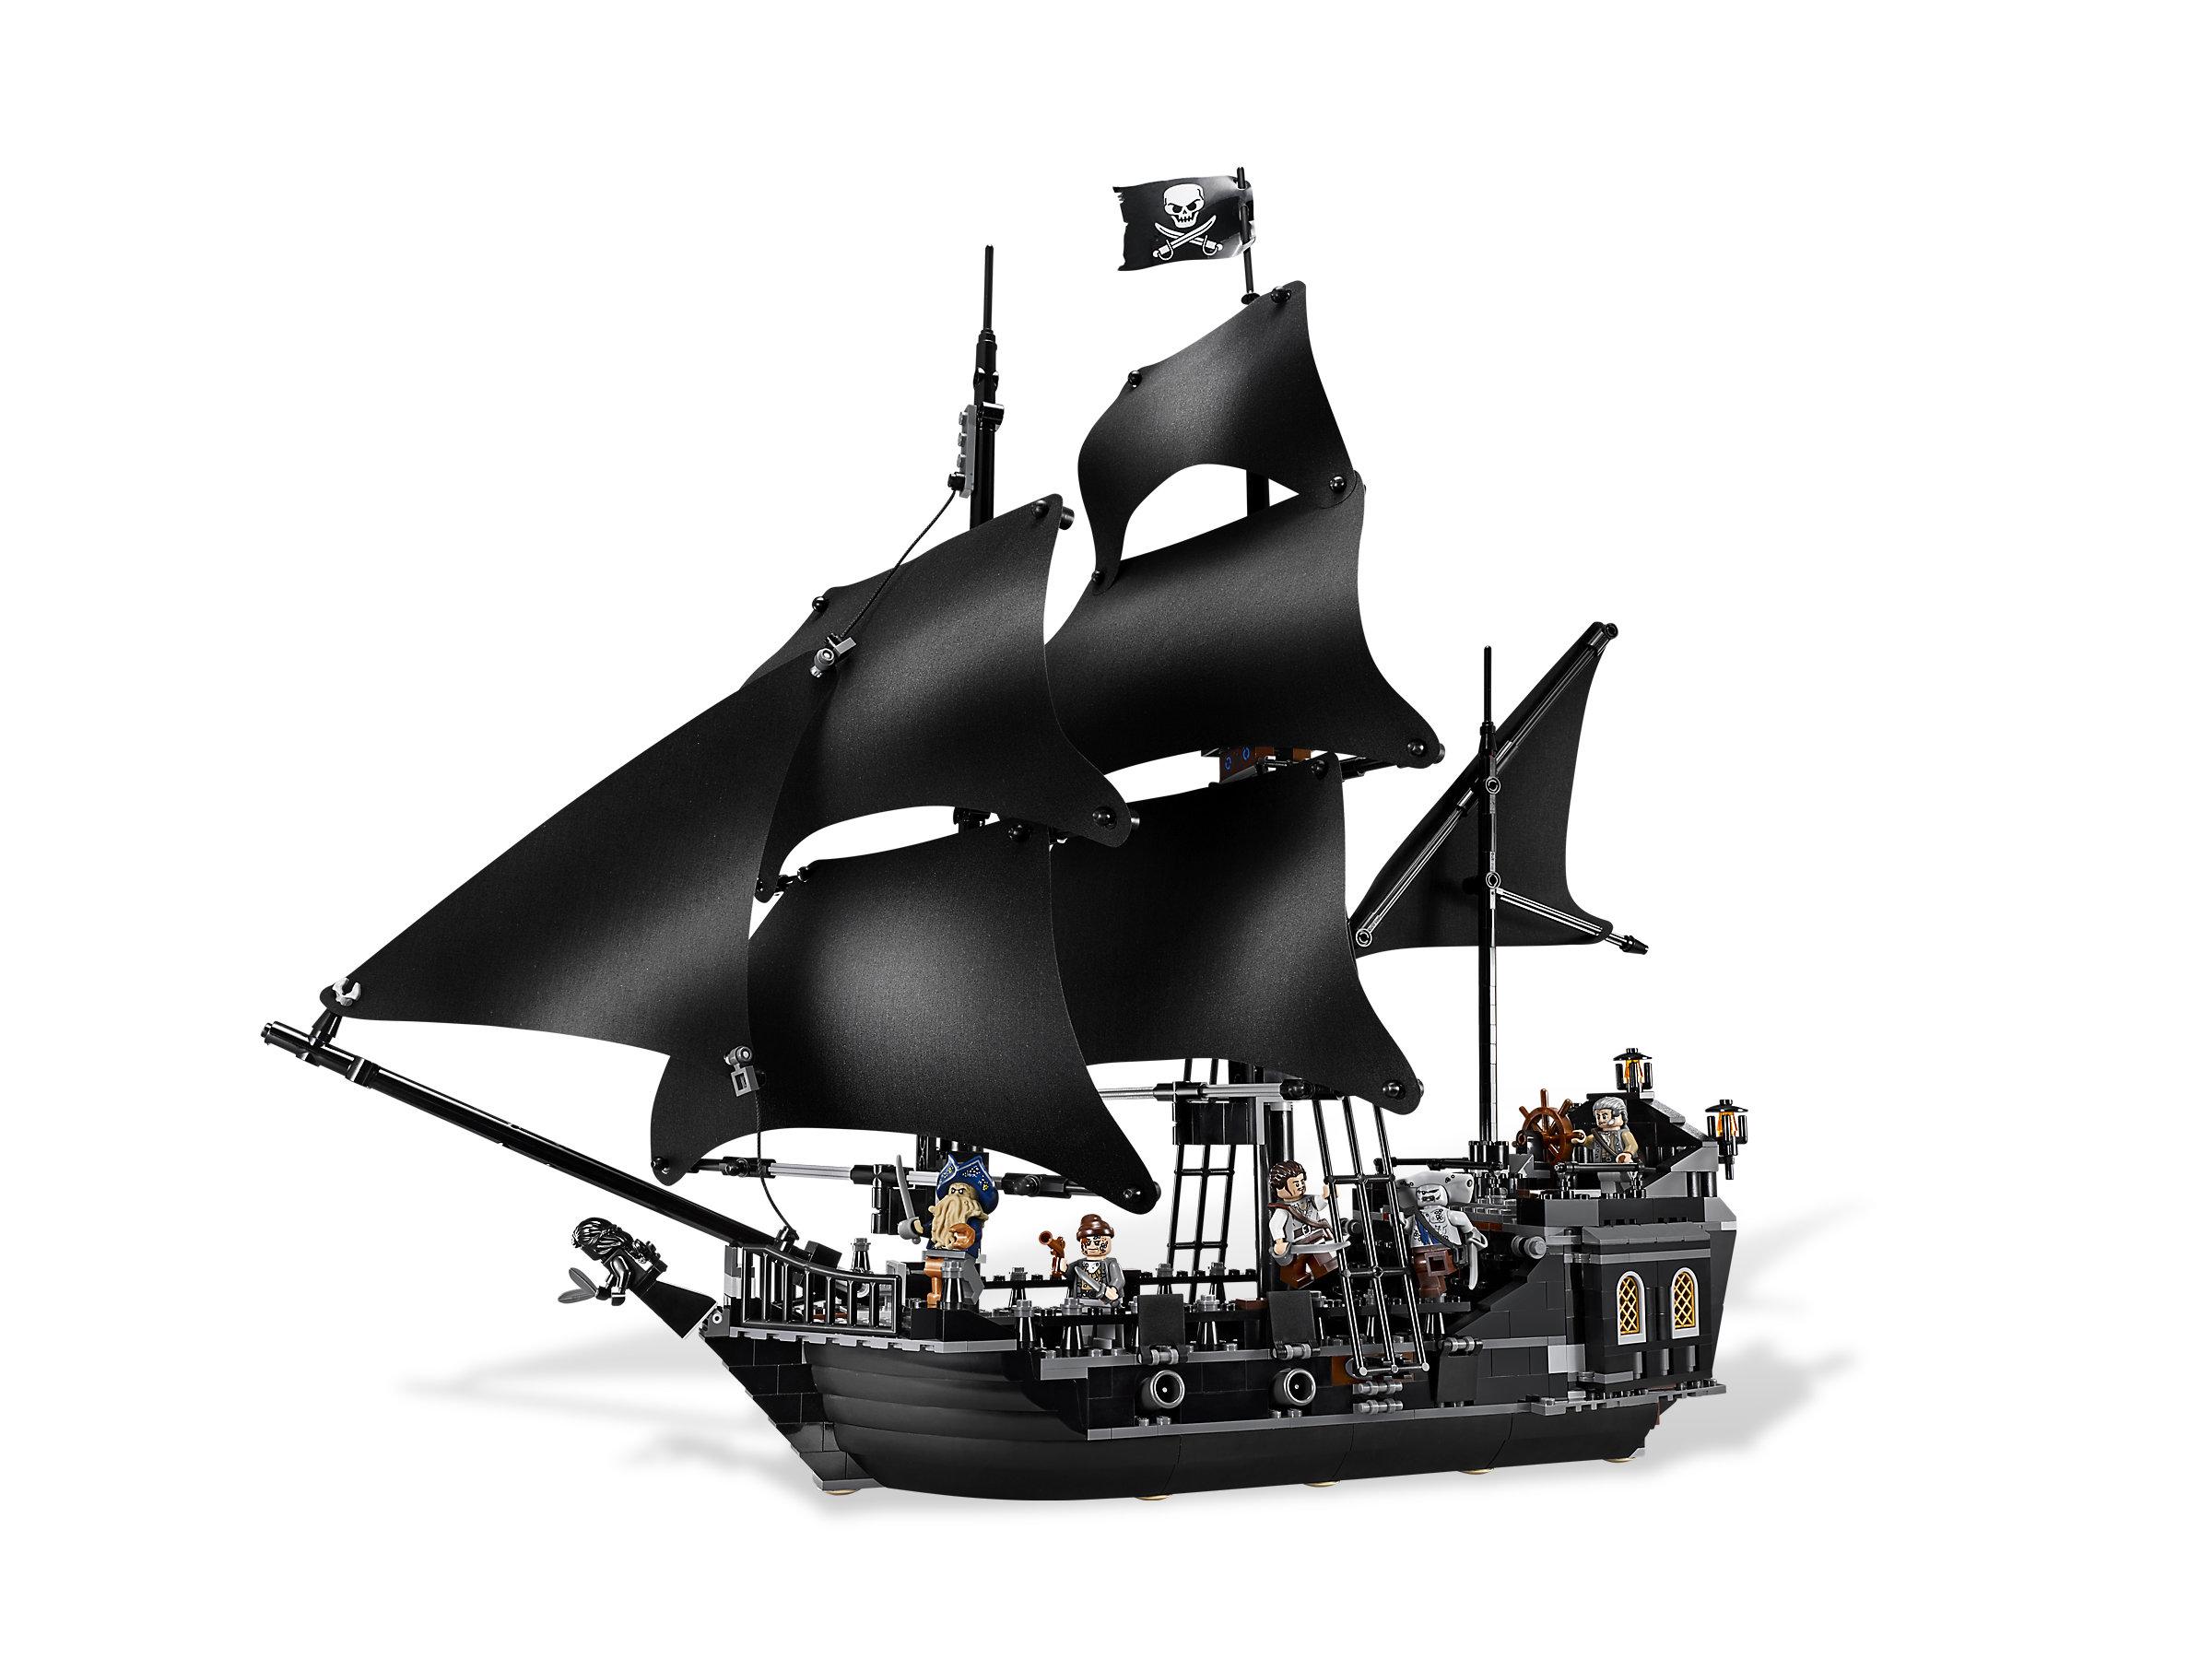 Black Pearl Ship  Captain Jack Sparrow Lego 4184 Model 2020 New